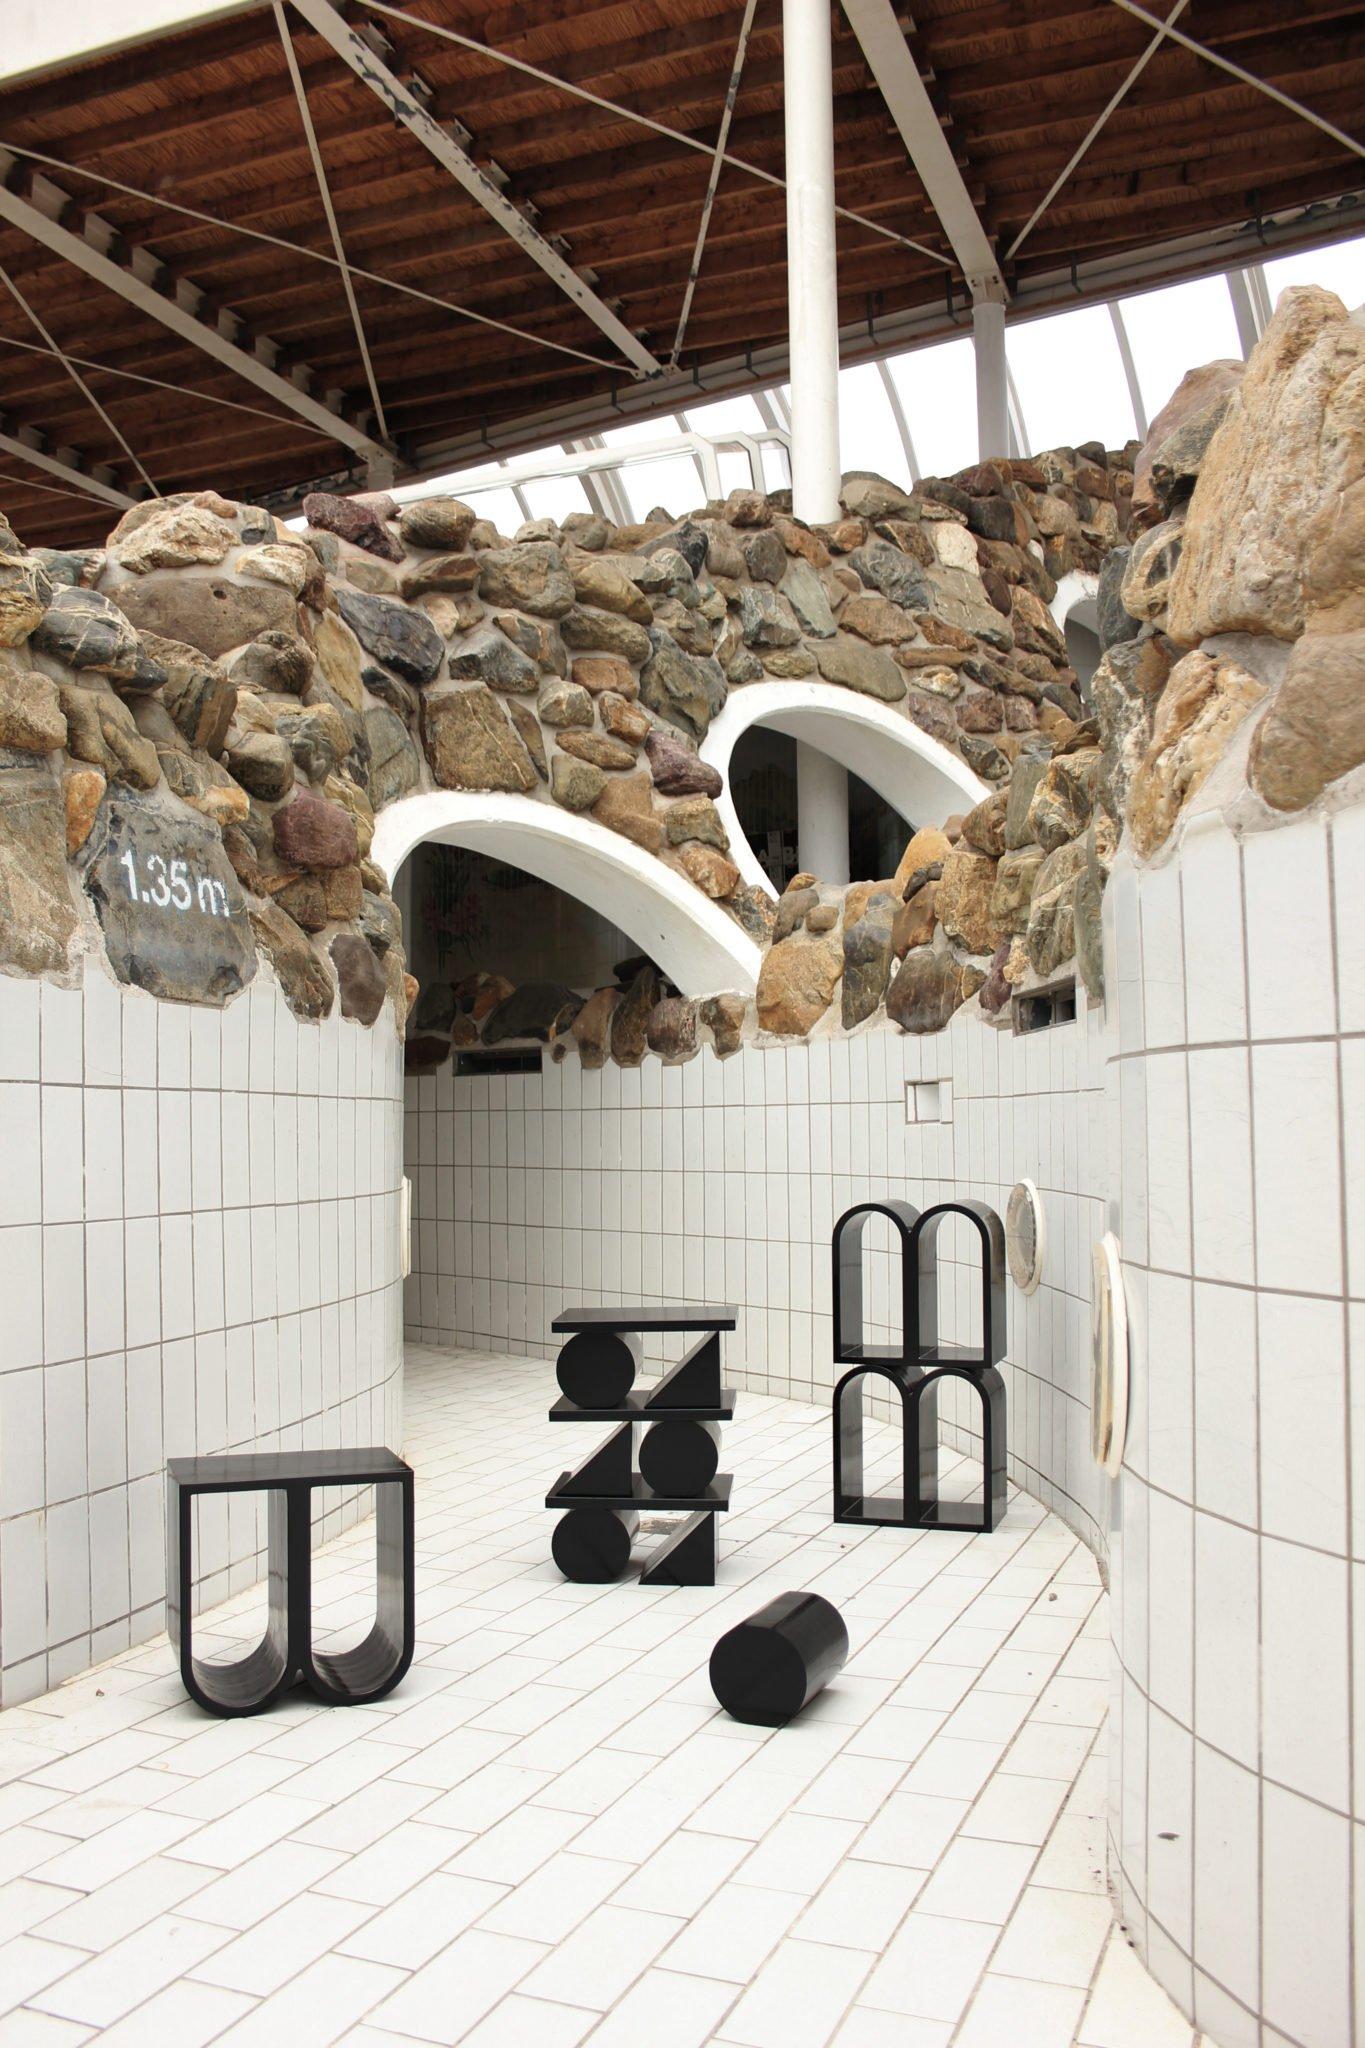 Mobilier design sculptural designer néerlandais Jordi Verbaan